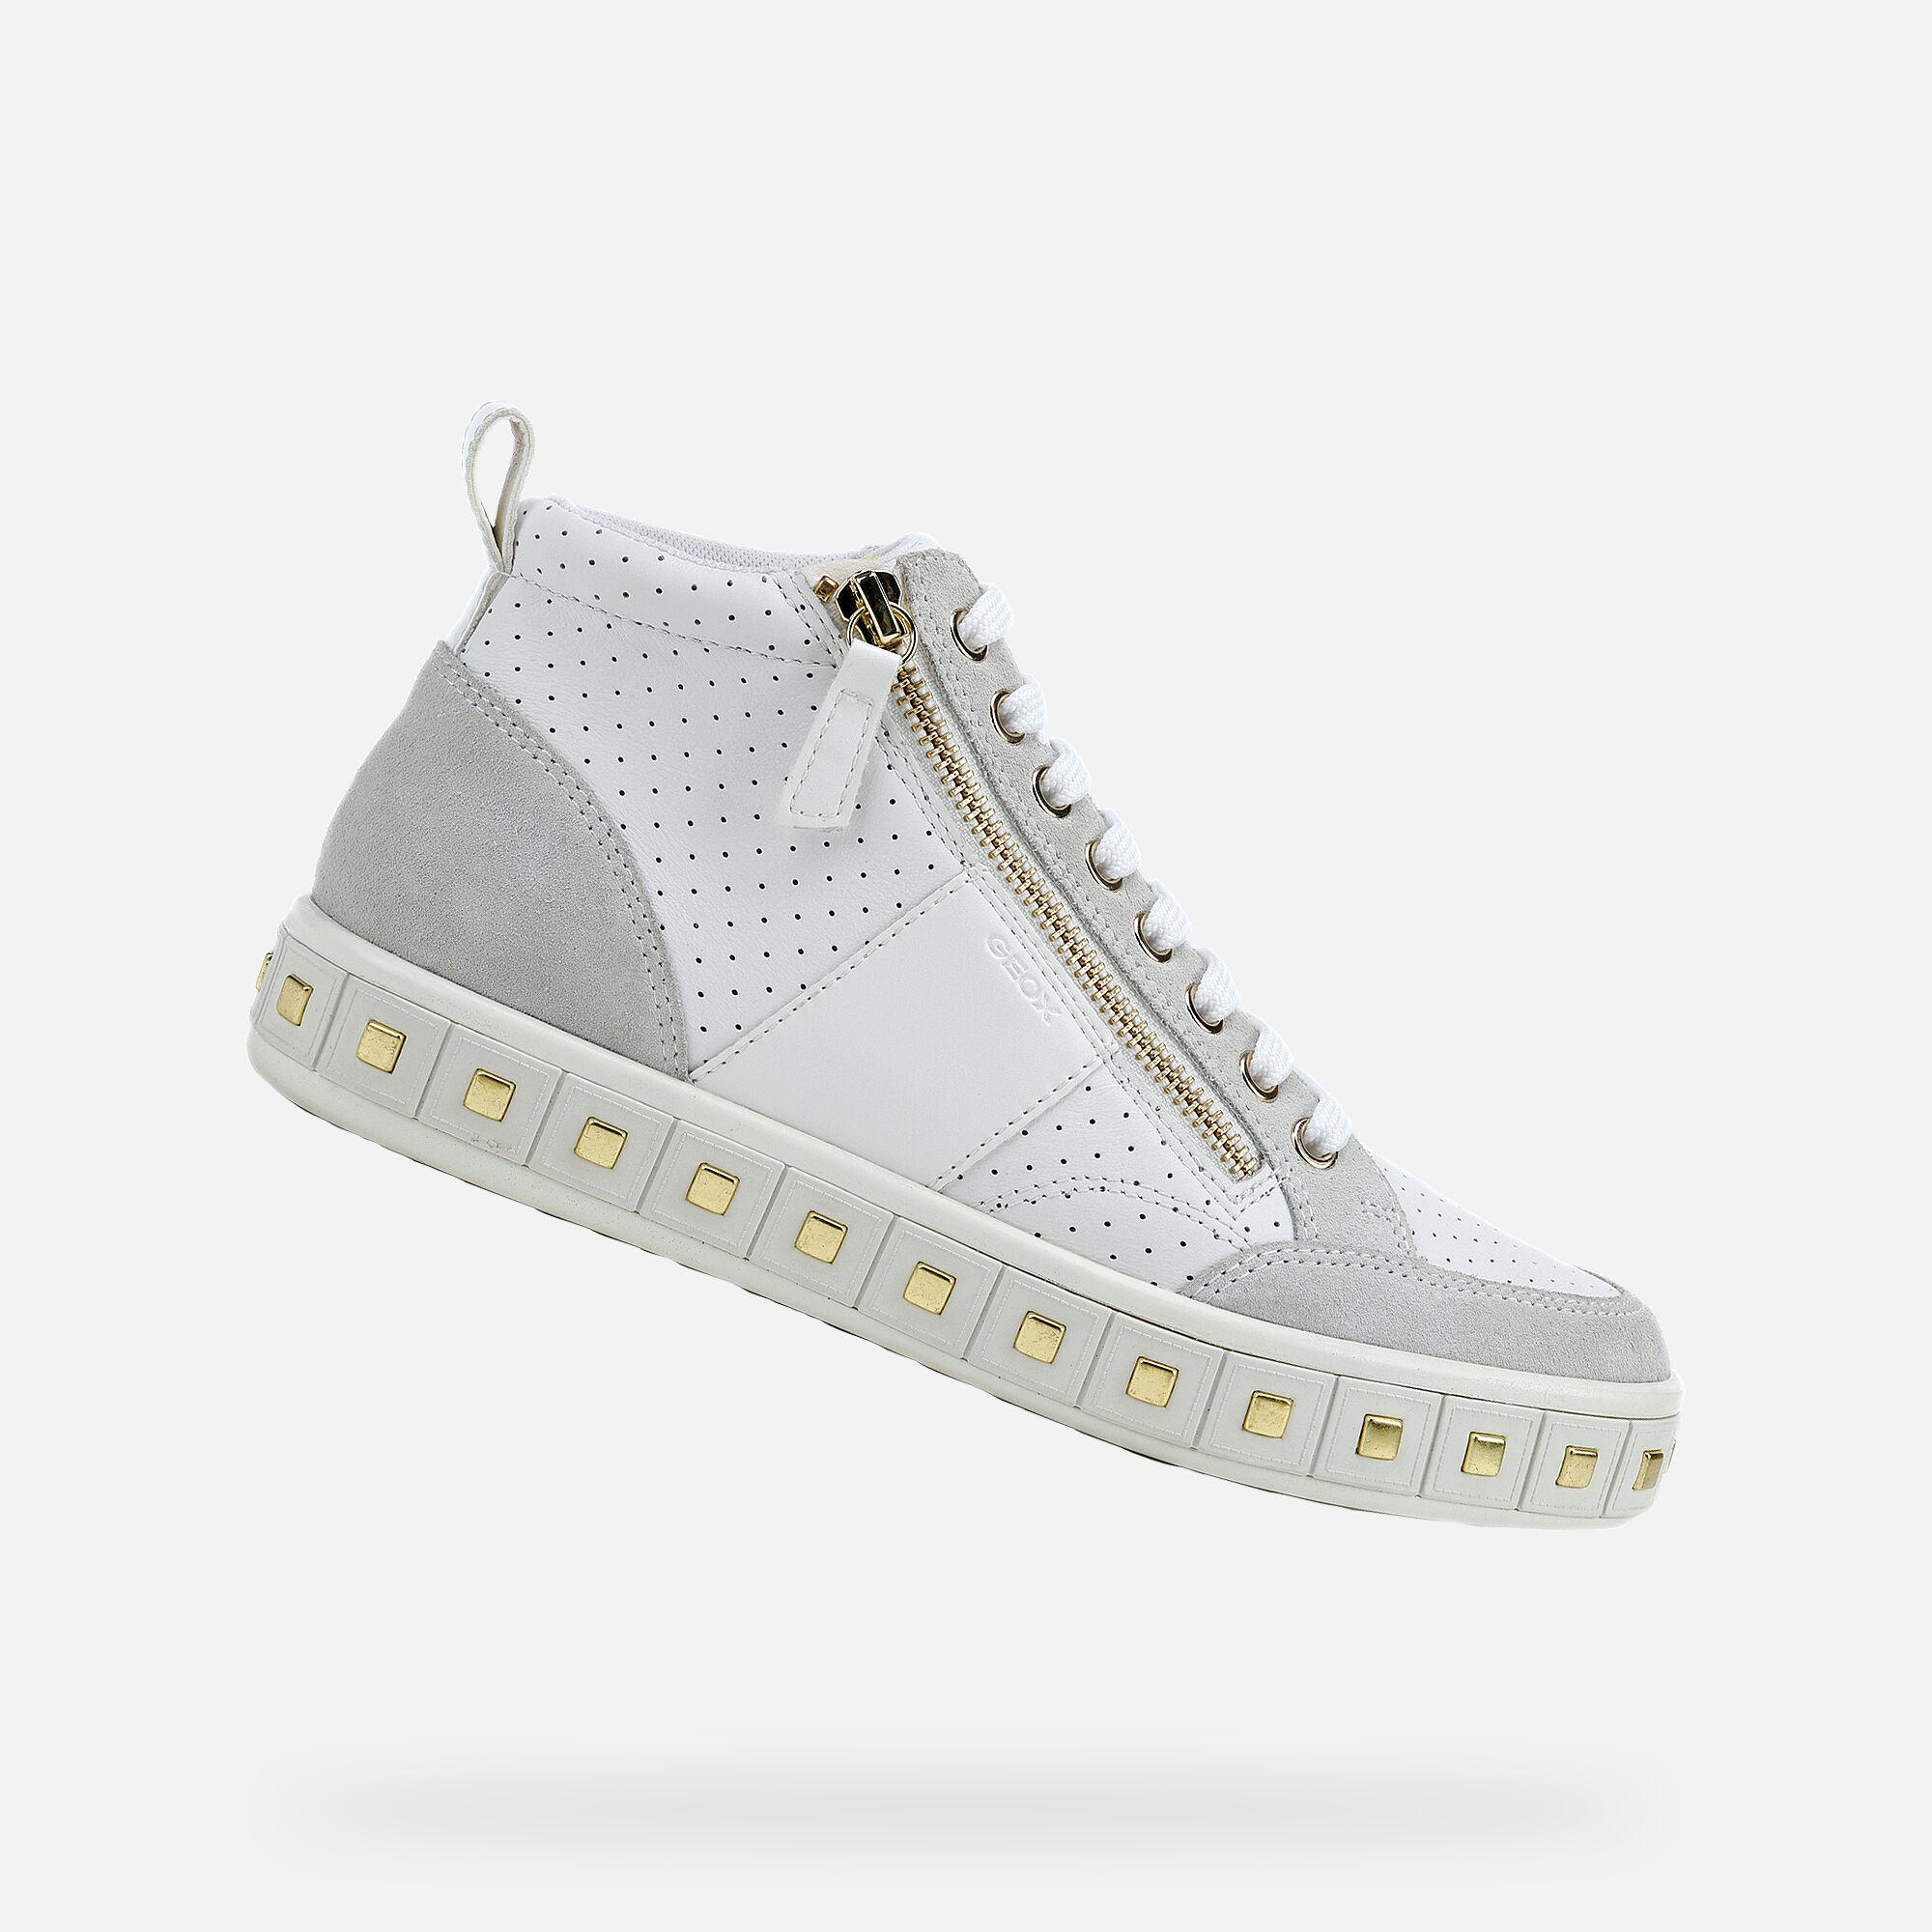 Waterproof White Sneakers Geox Amphibiox | White sneakers